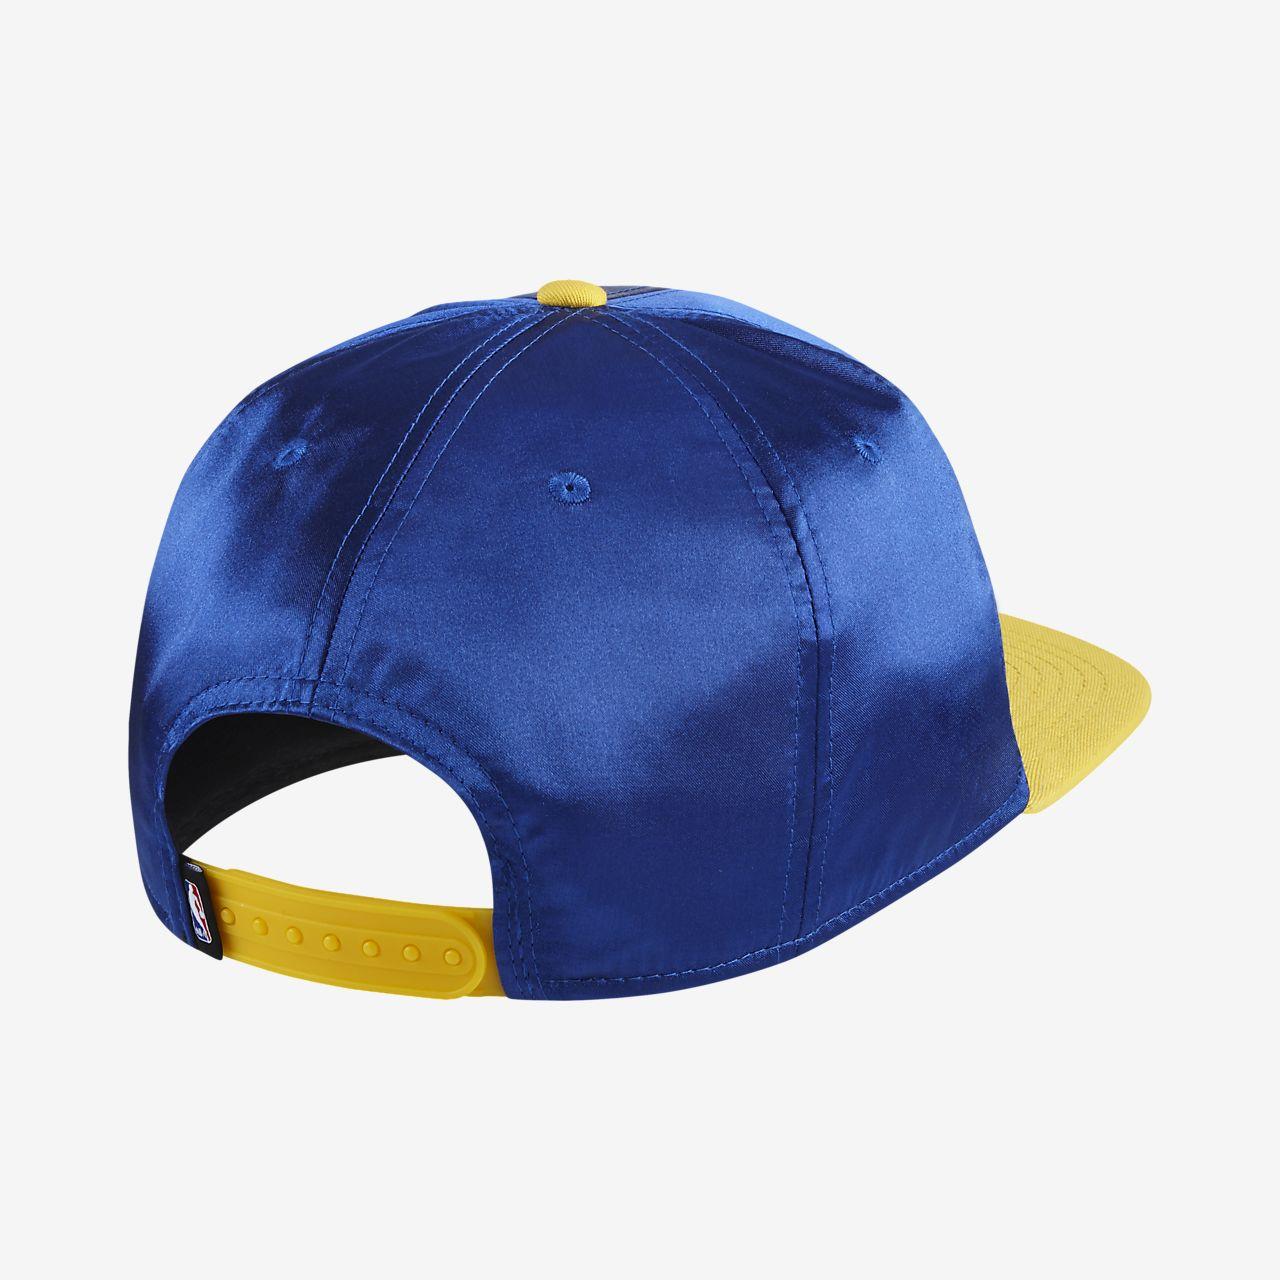 7705725db89 nike unisex hat online   OFF49% Discounts